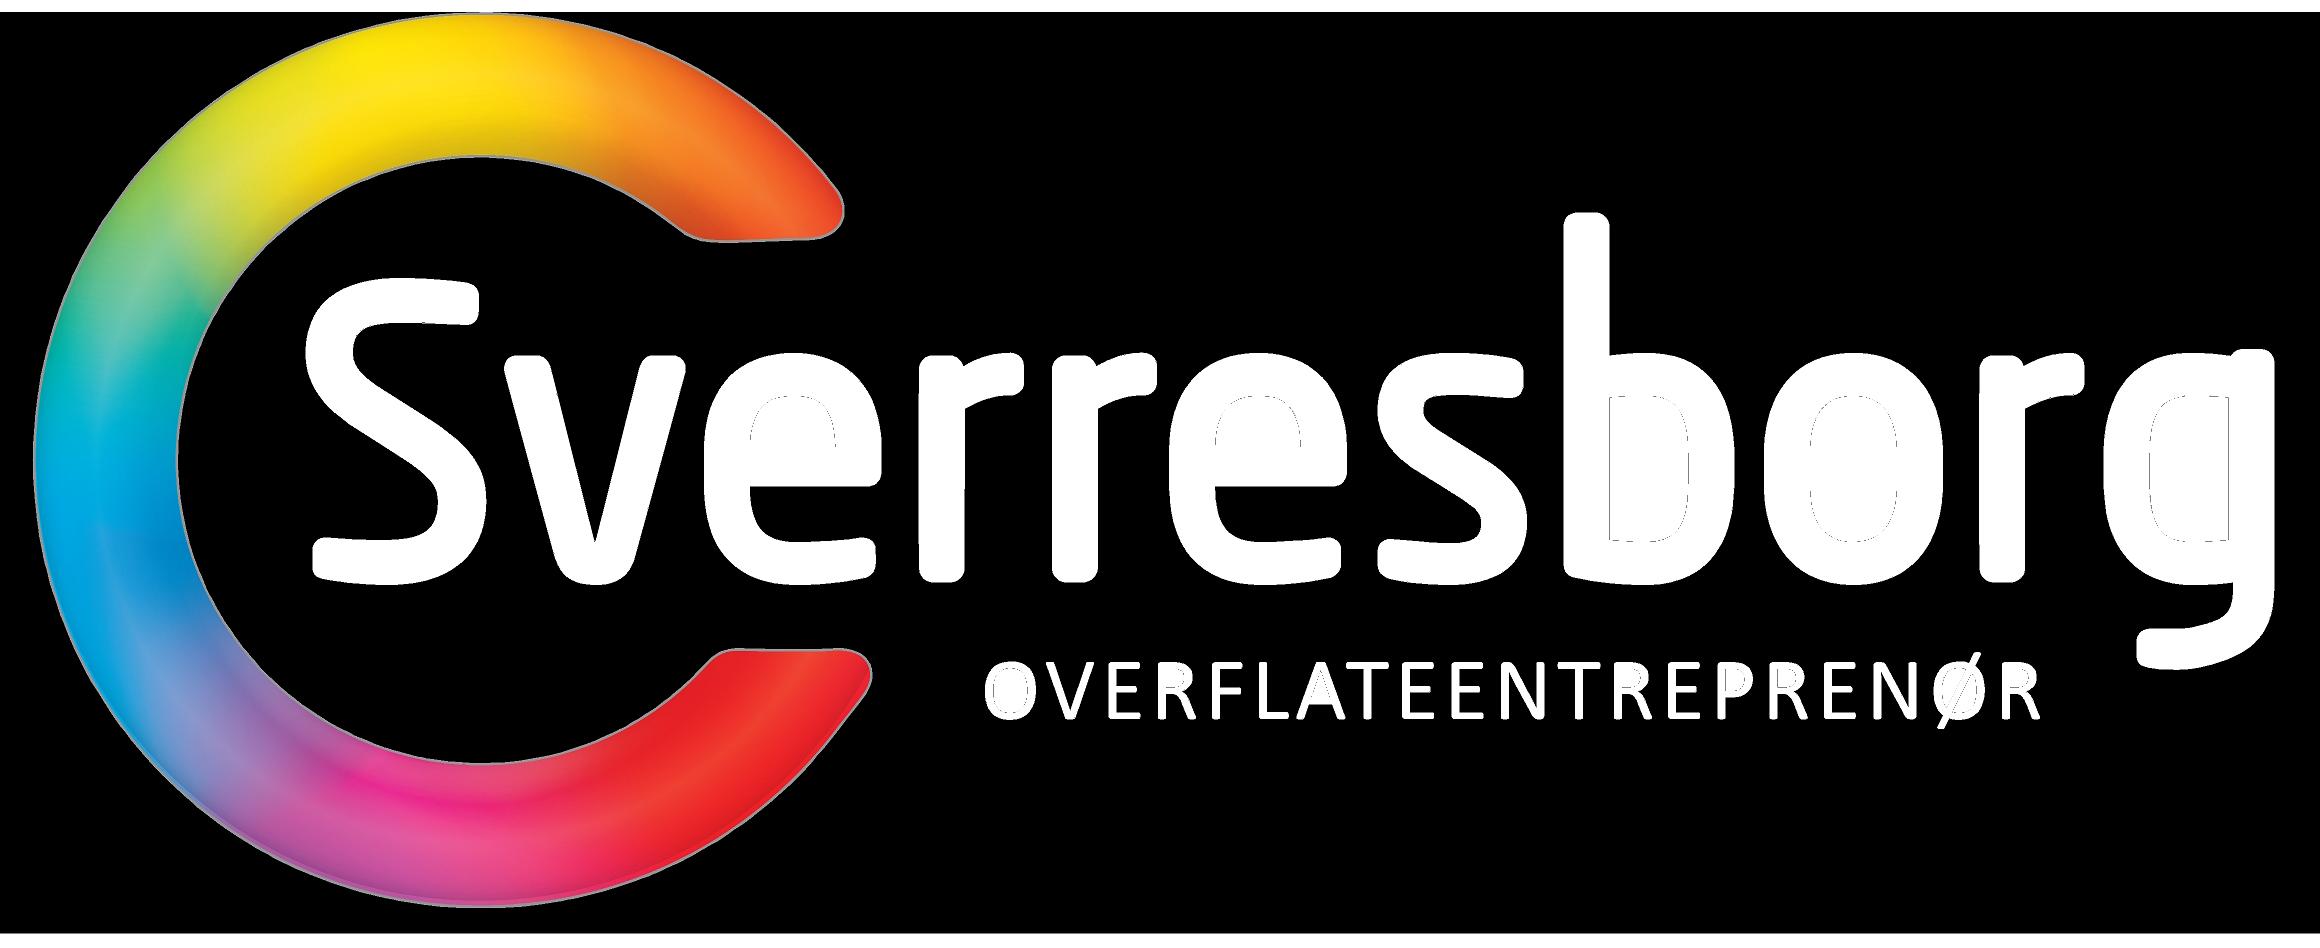 Sverresborg Malerservice AS